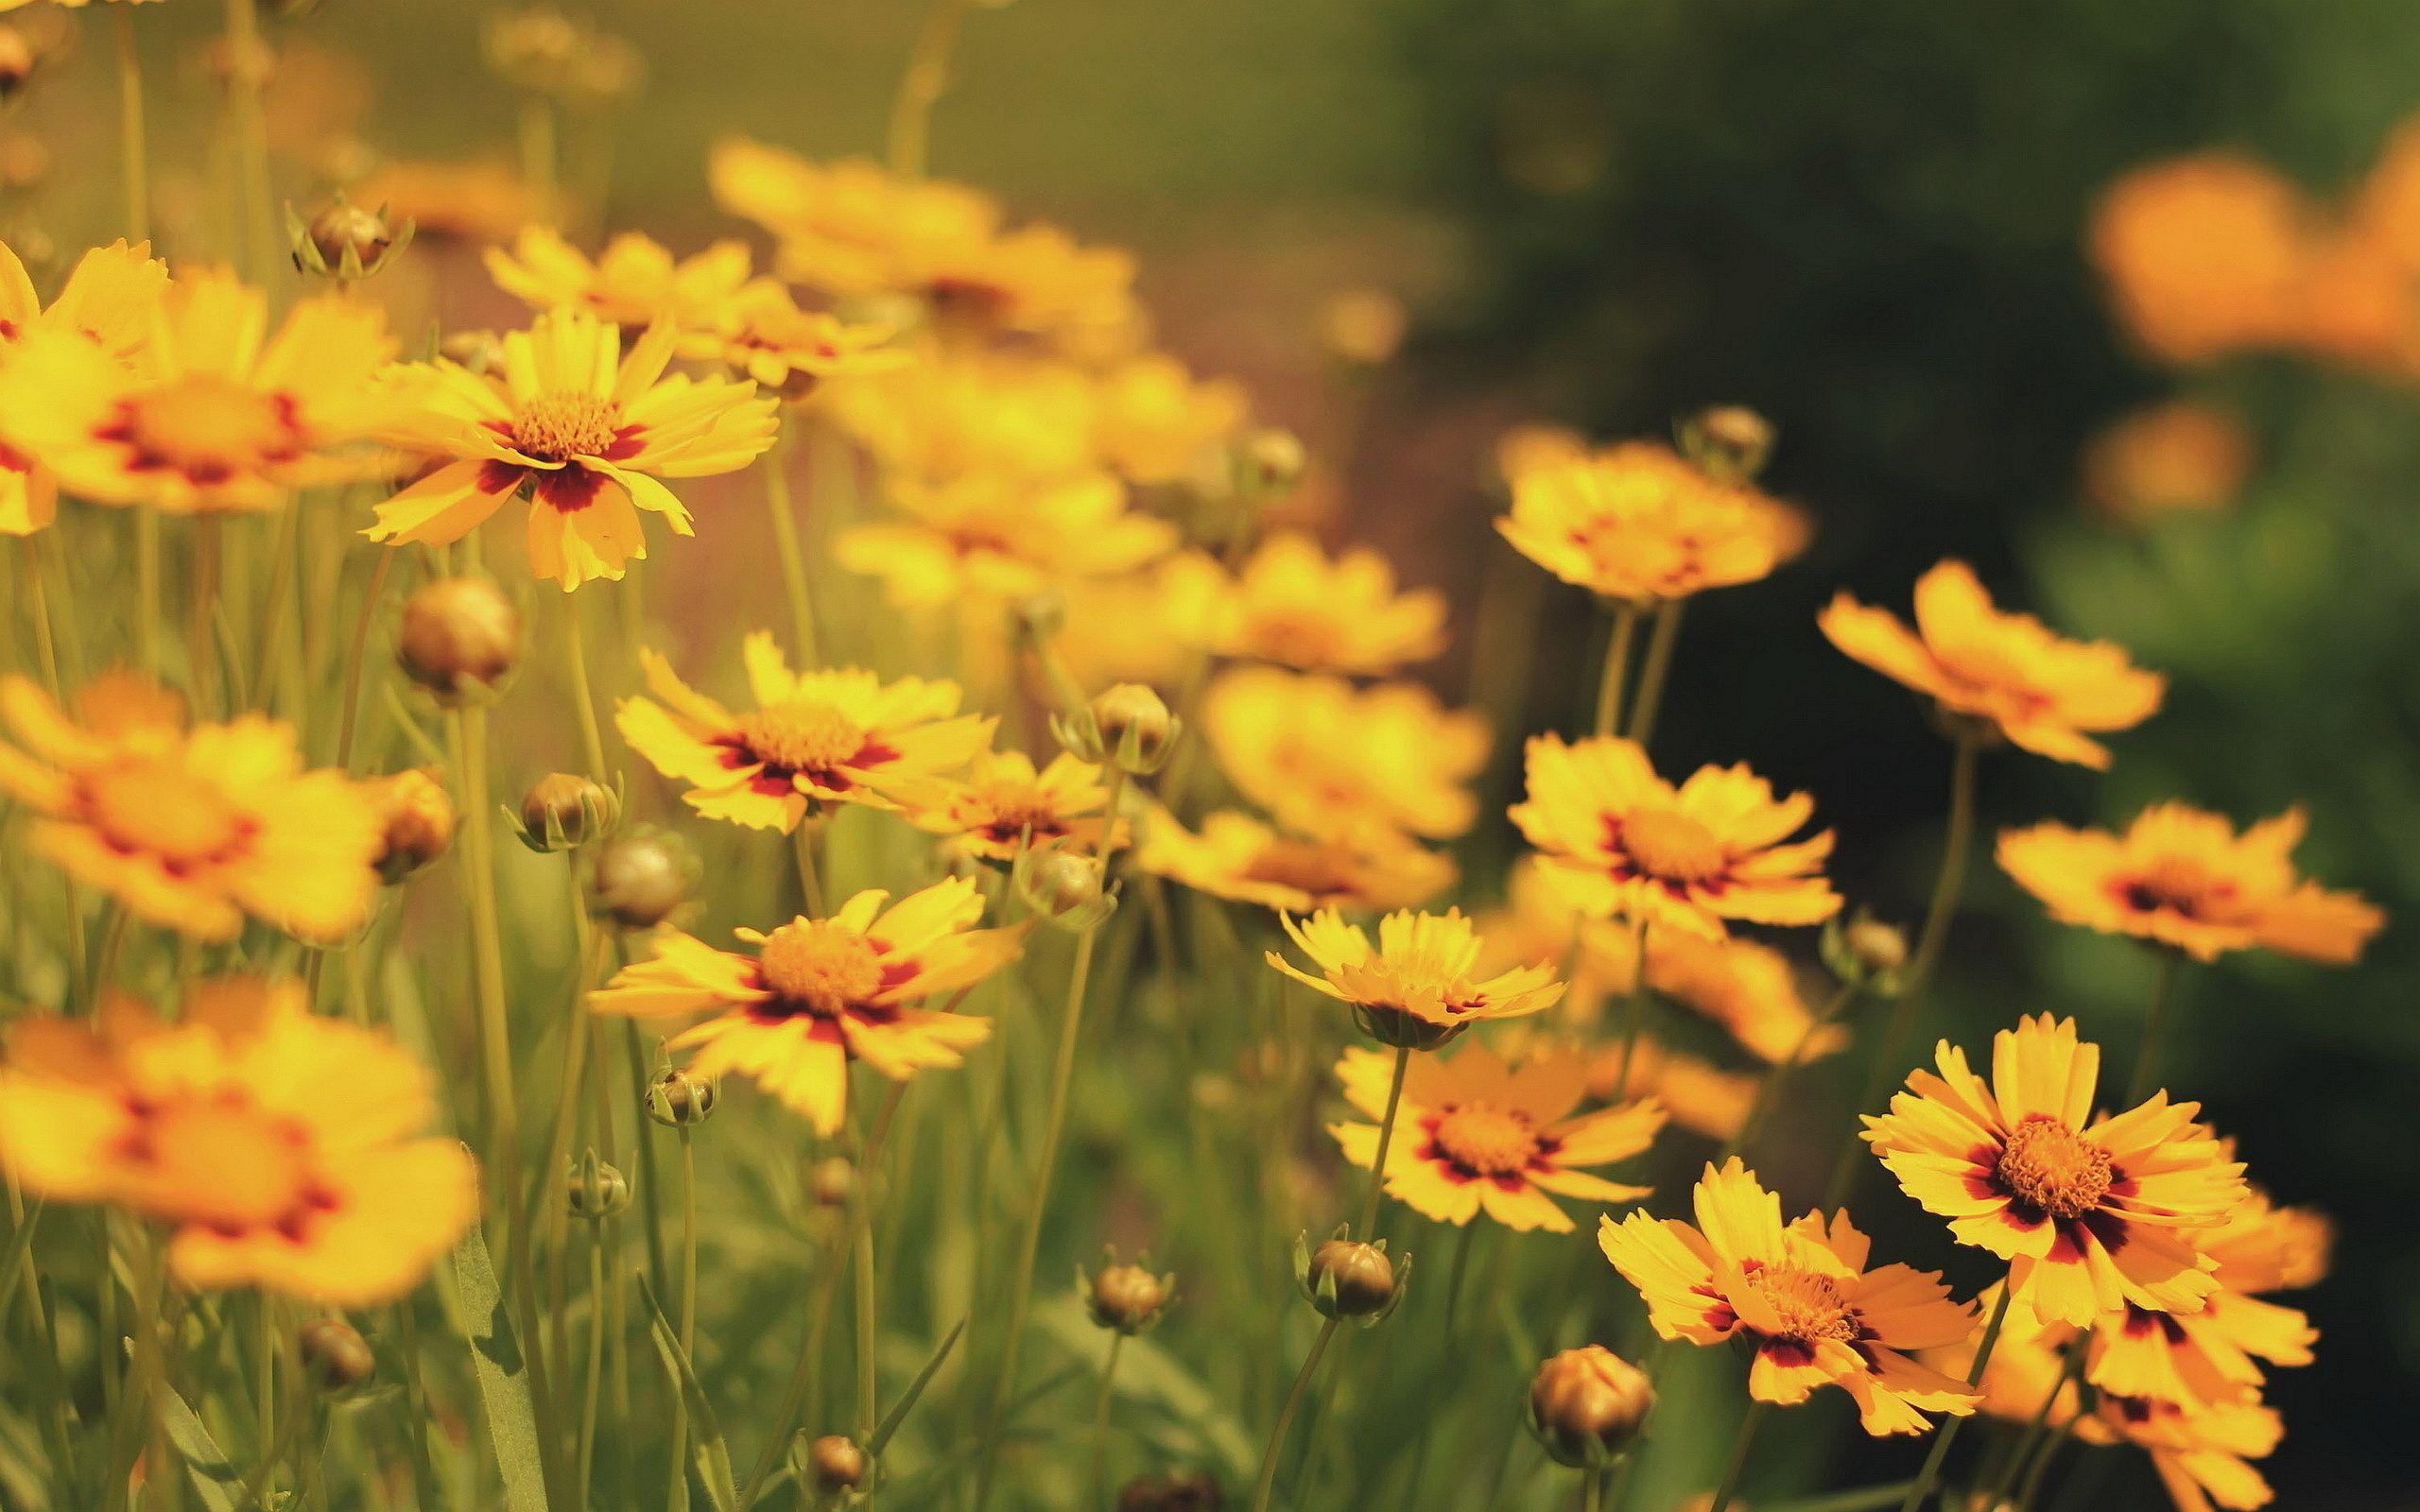 Beautiful flower field background 13407 flower power pinterest beautiful flower field background 13407 mightylinksfo Images